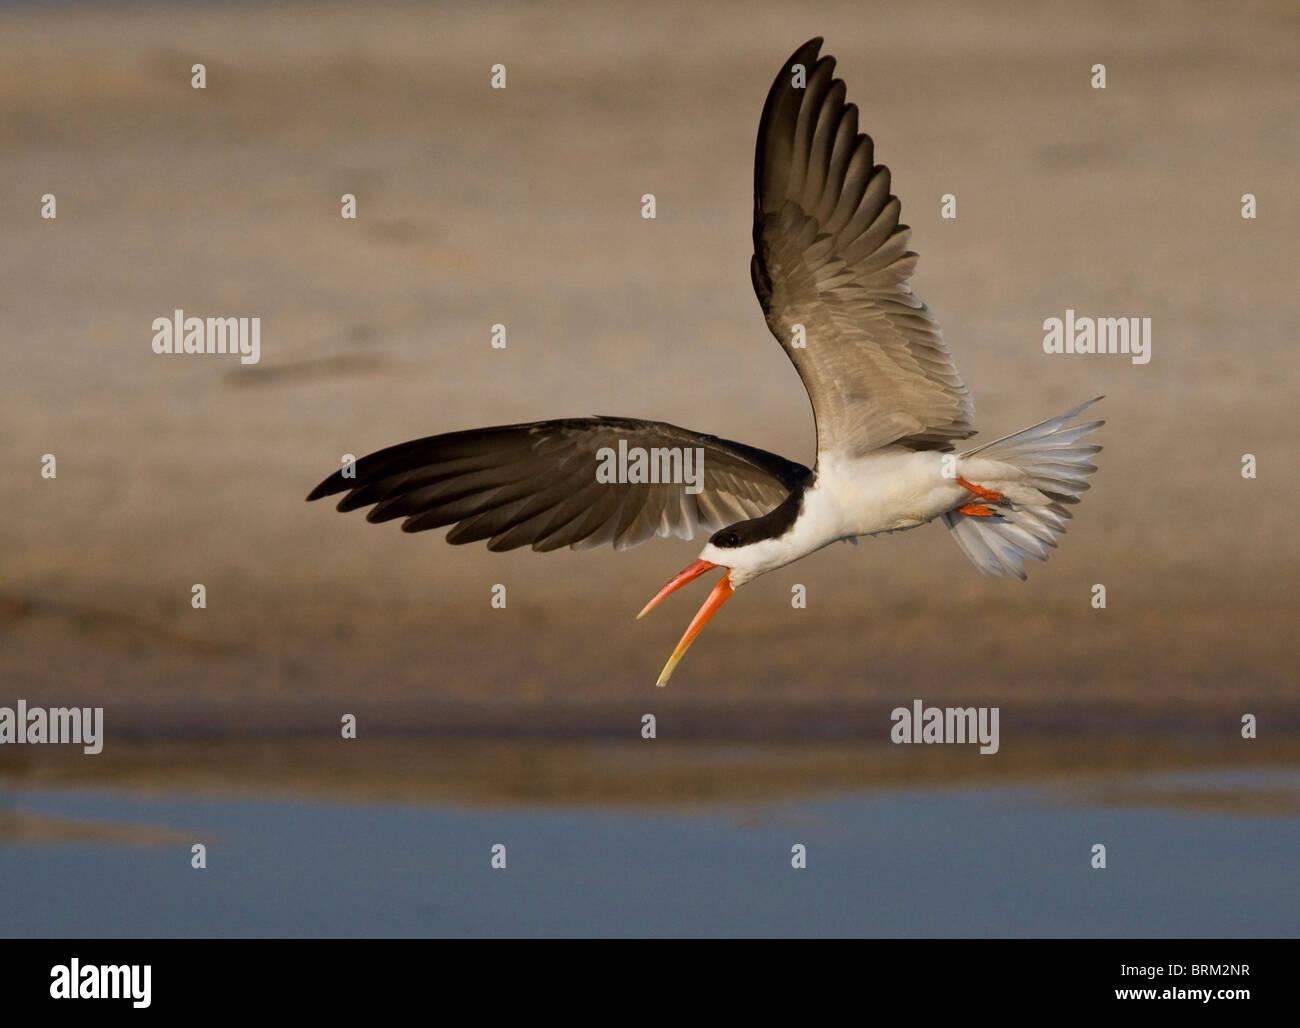 African skimmer in flight - Stock Image